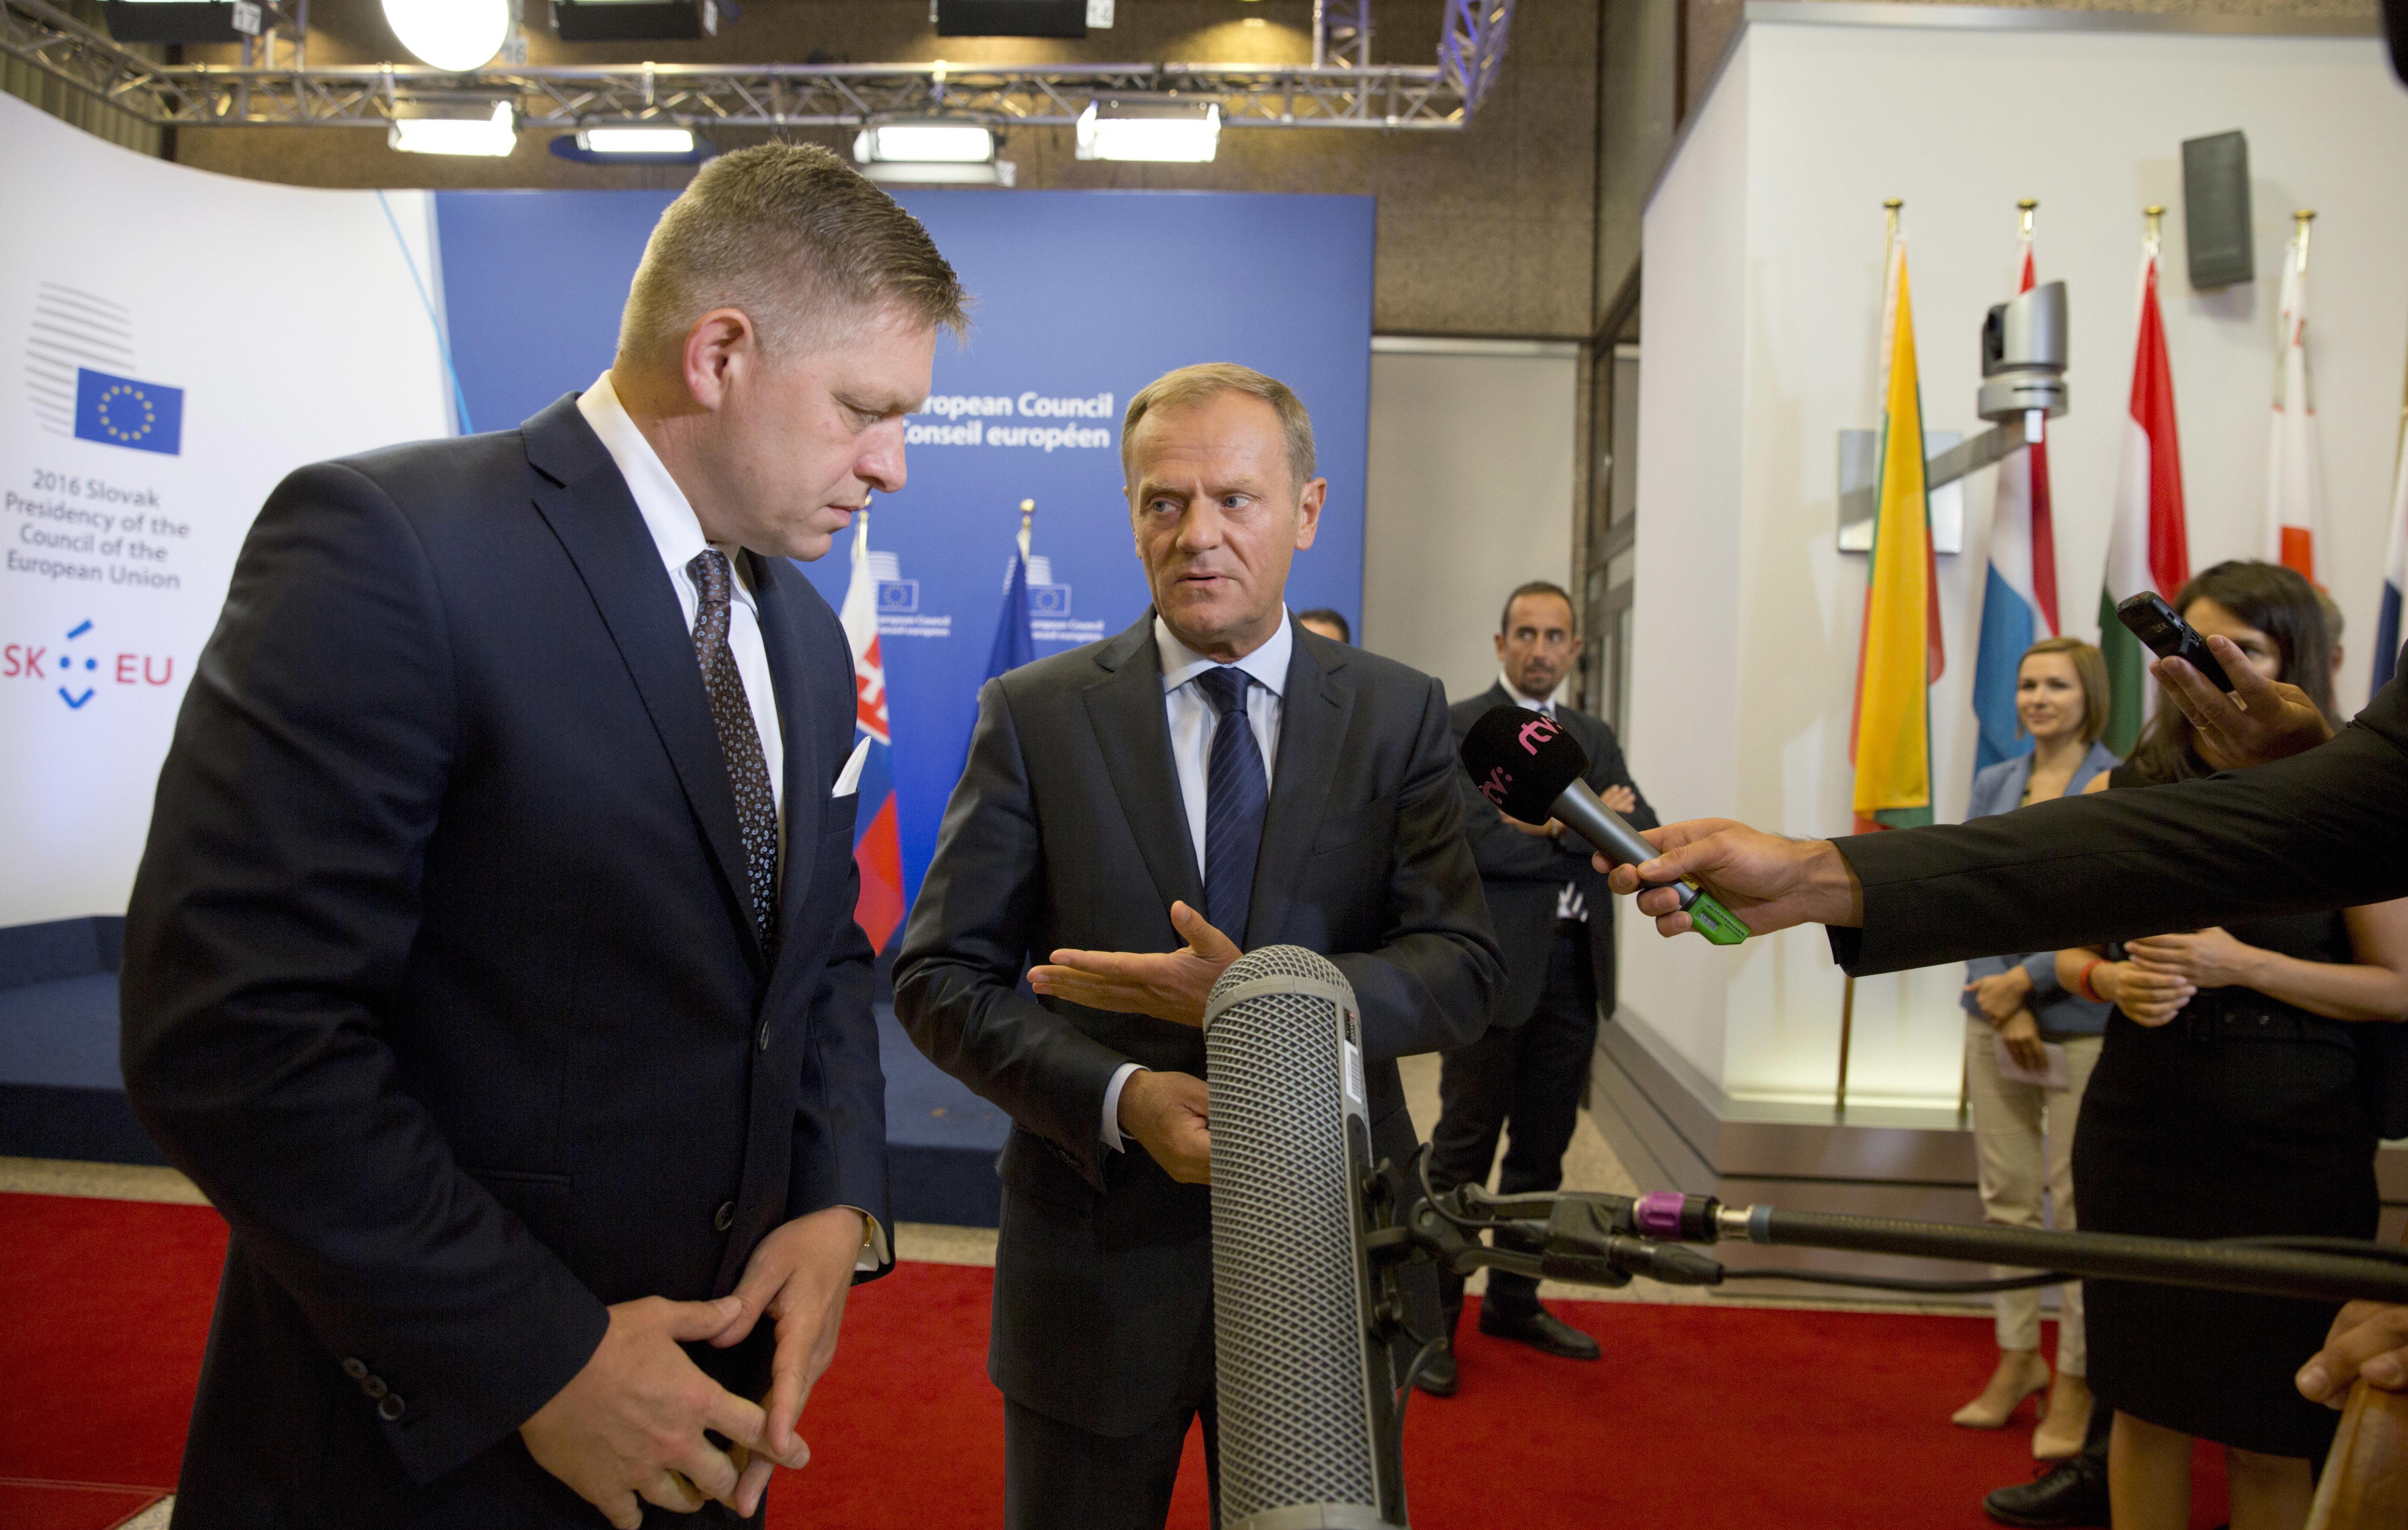 fico bratislavský summit eurovýbor